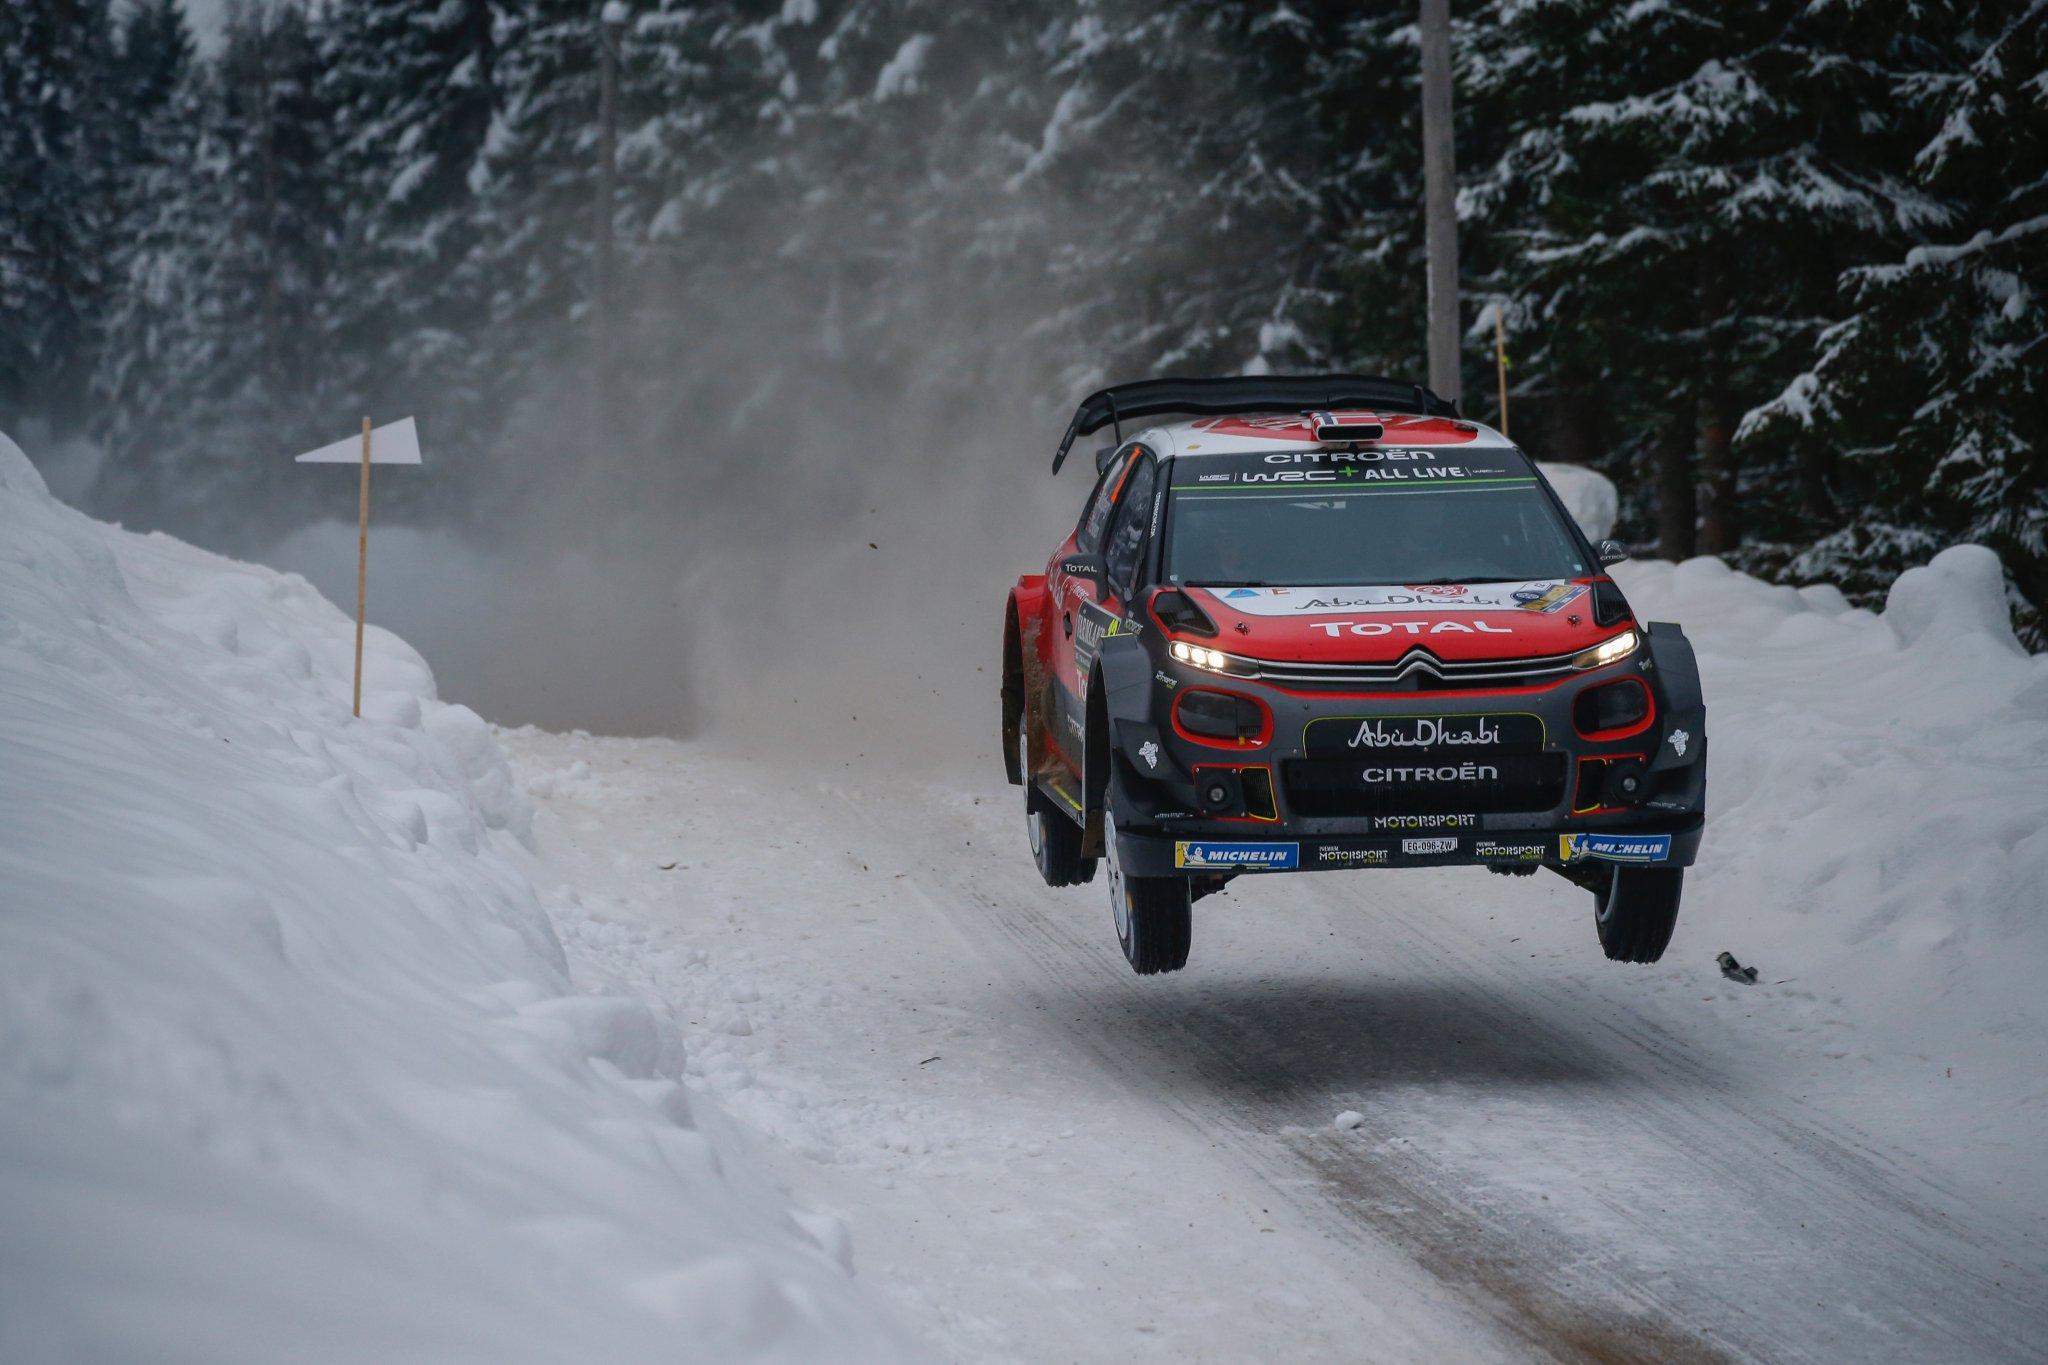 http://www.autosport.bg/wp-content/uploads/2018/02/DWOsppoXUAAnEcN.jpg